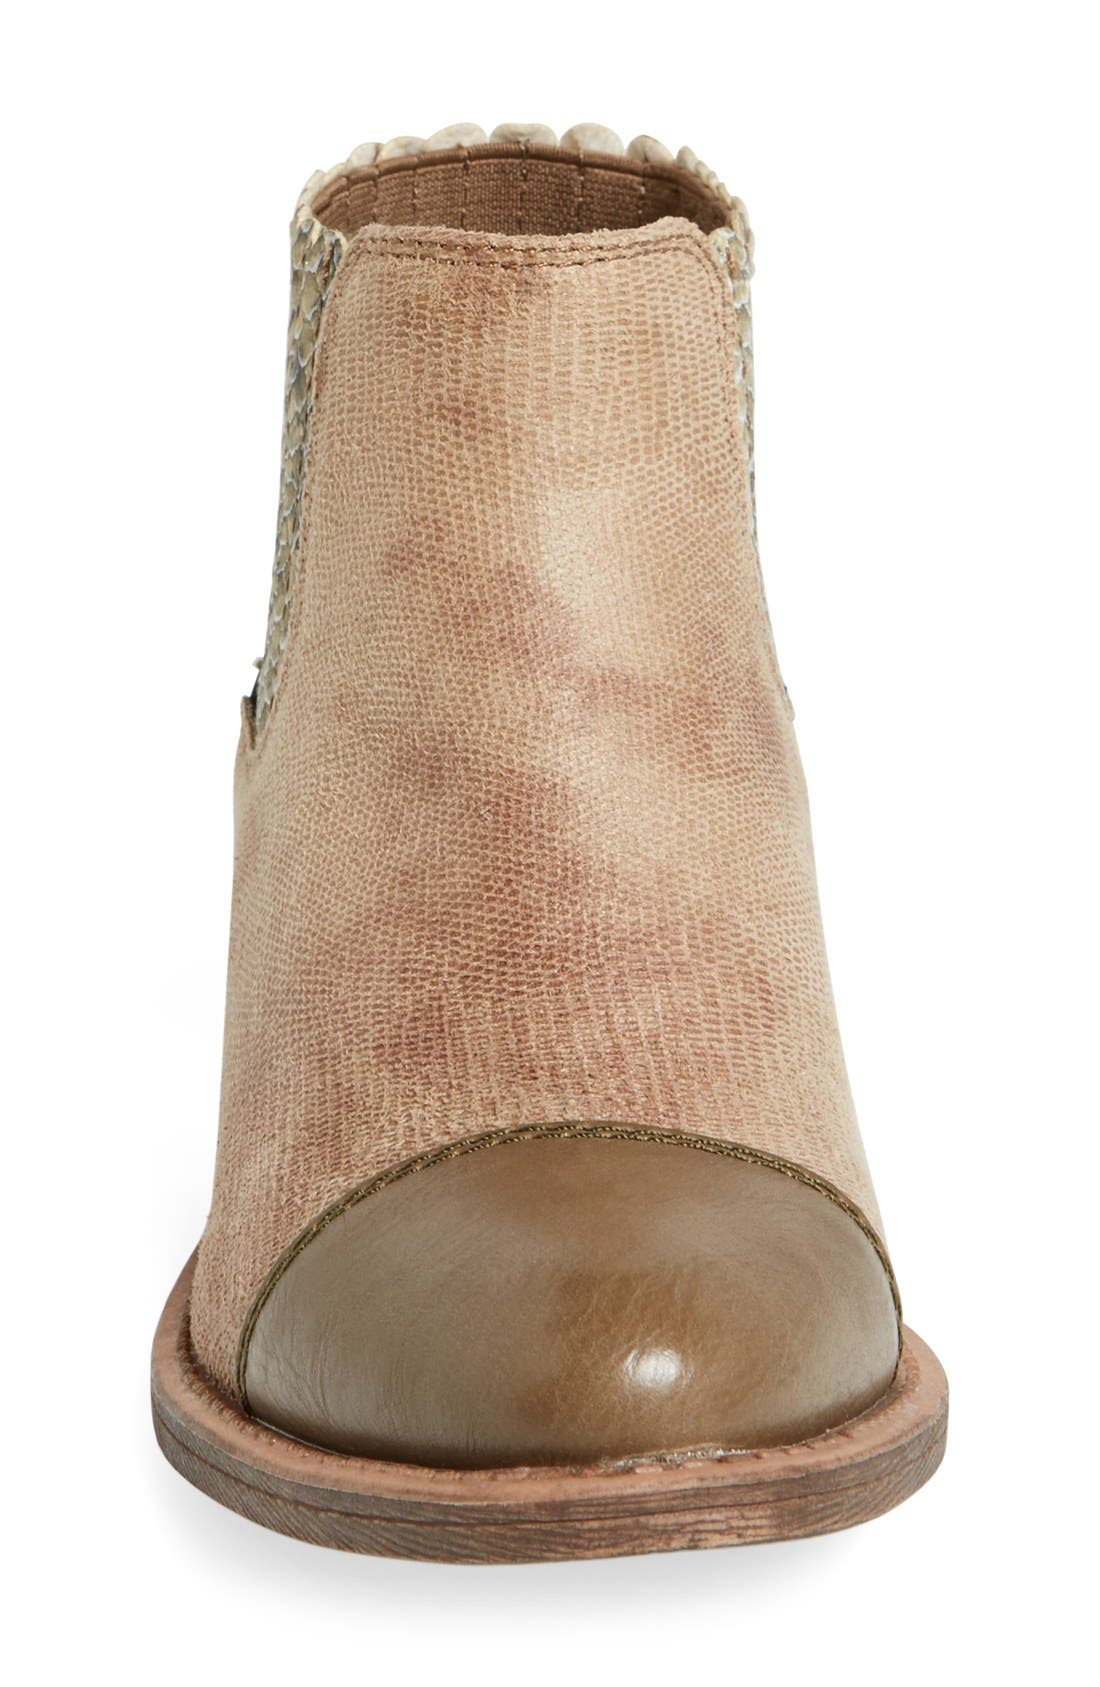 Alternate Image 3  - Coconuts by Matisse 'Blackjack' Ankle Boot (Women)